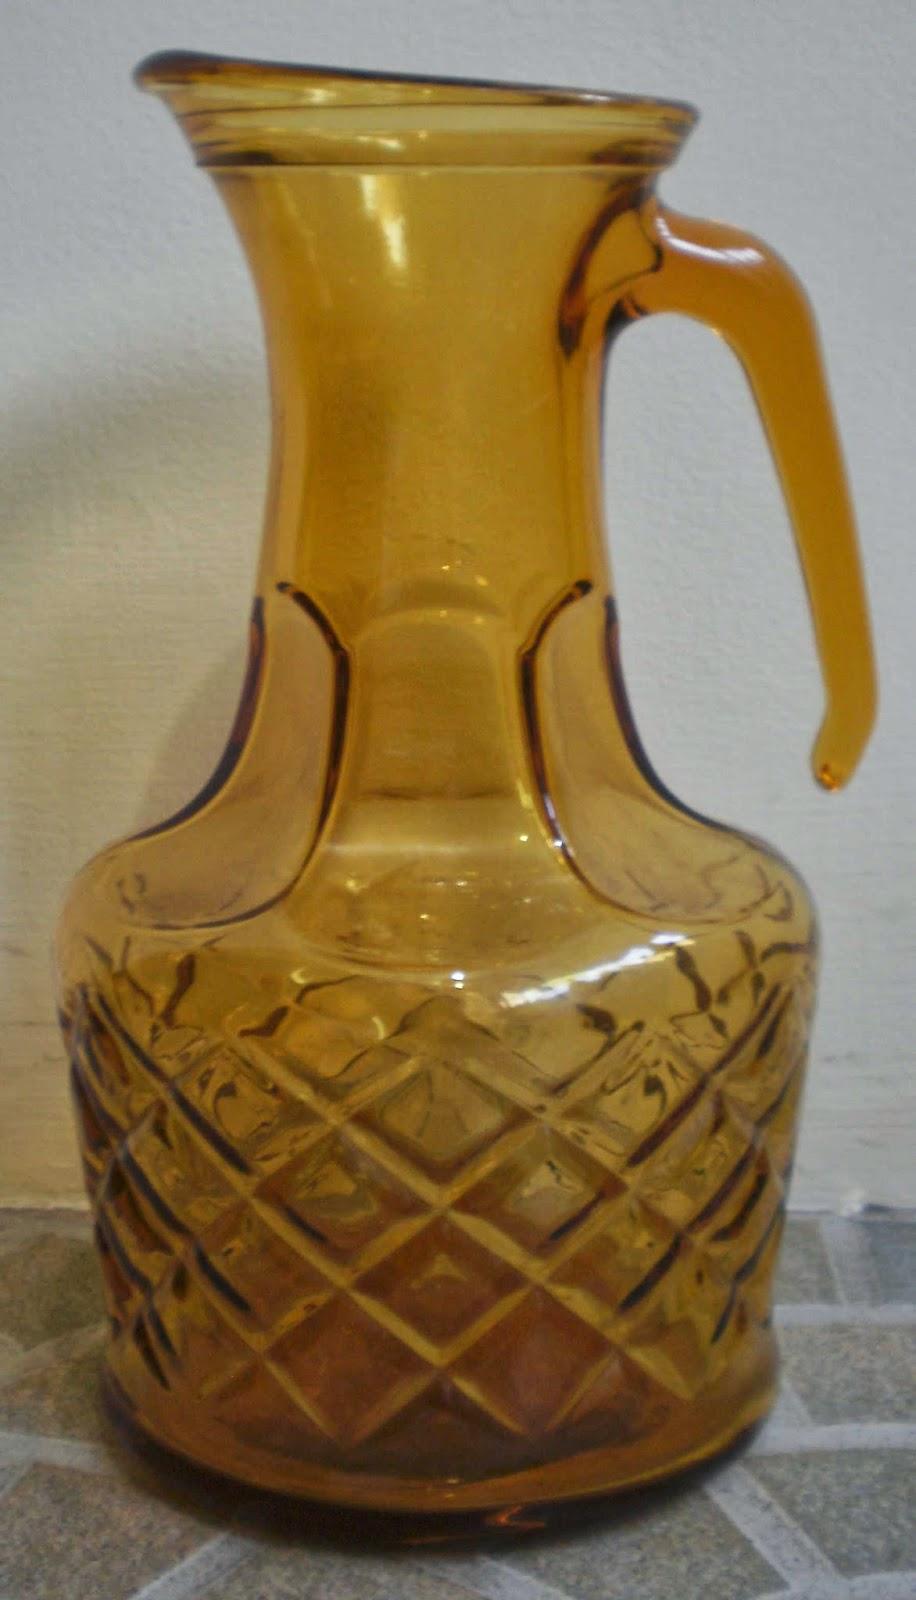 keramik vase made in ussr